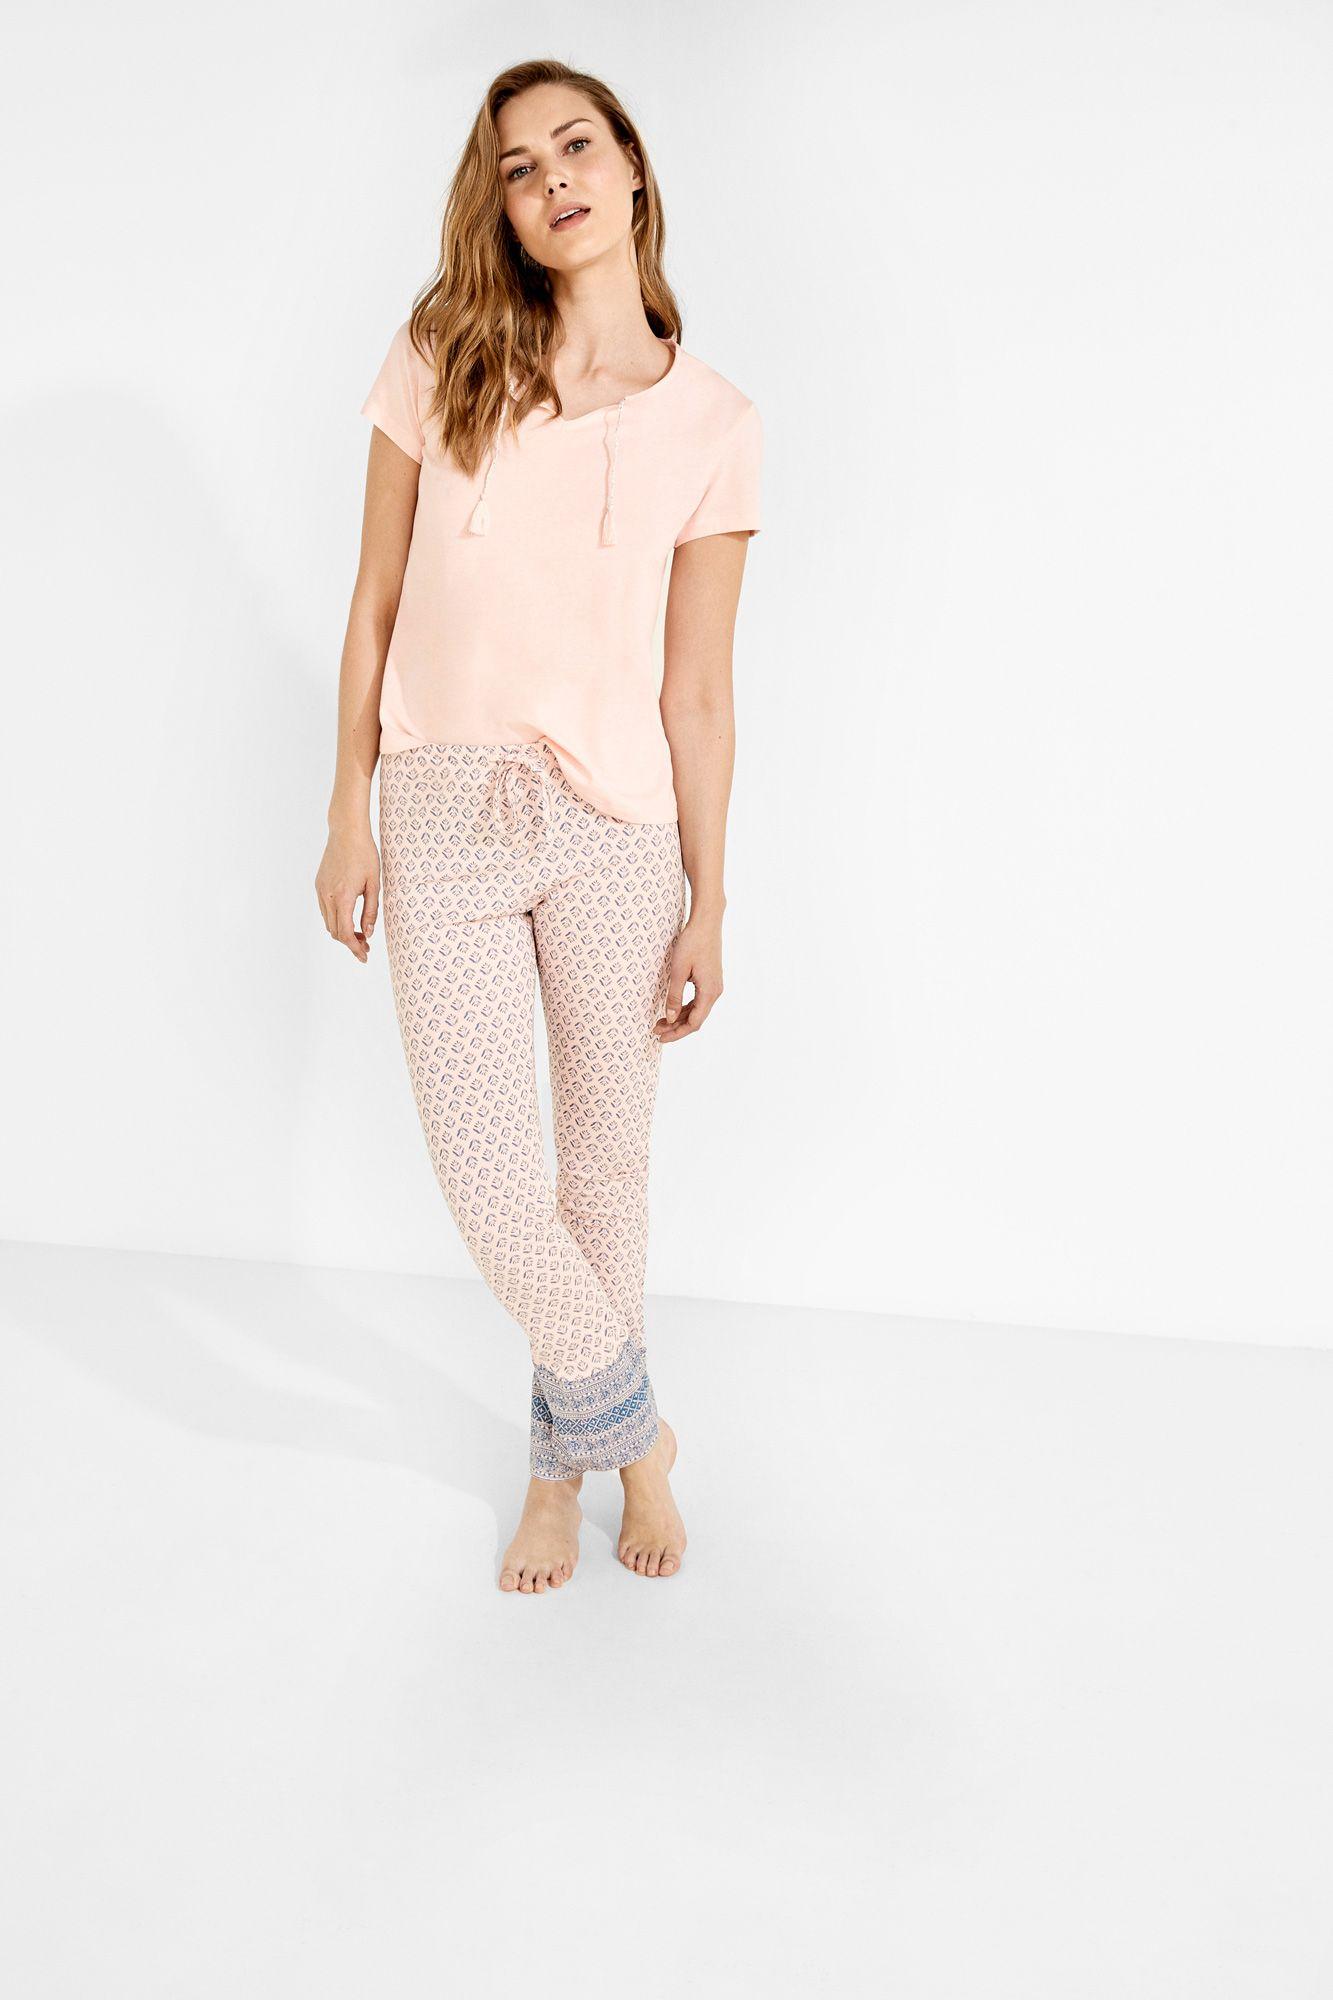 71238b9532 Pijama largo estampado